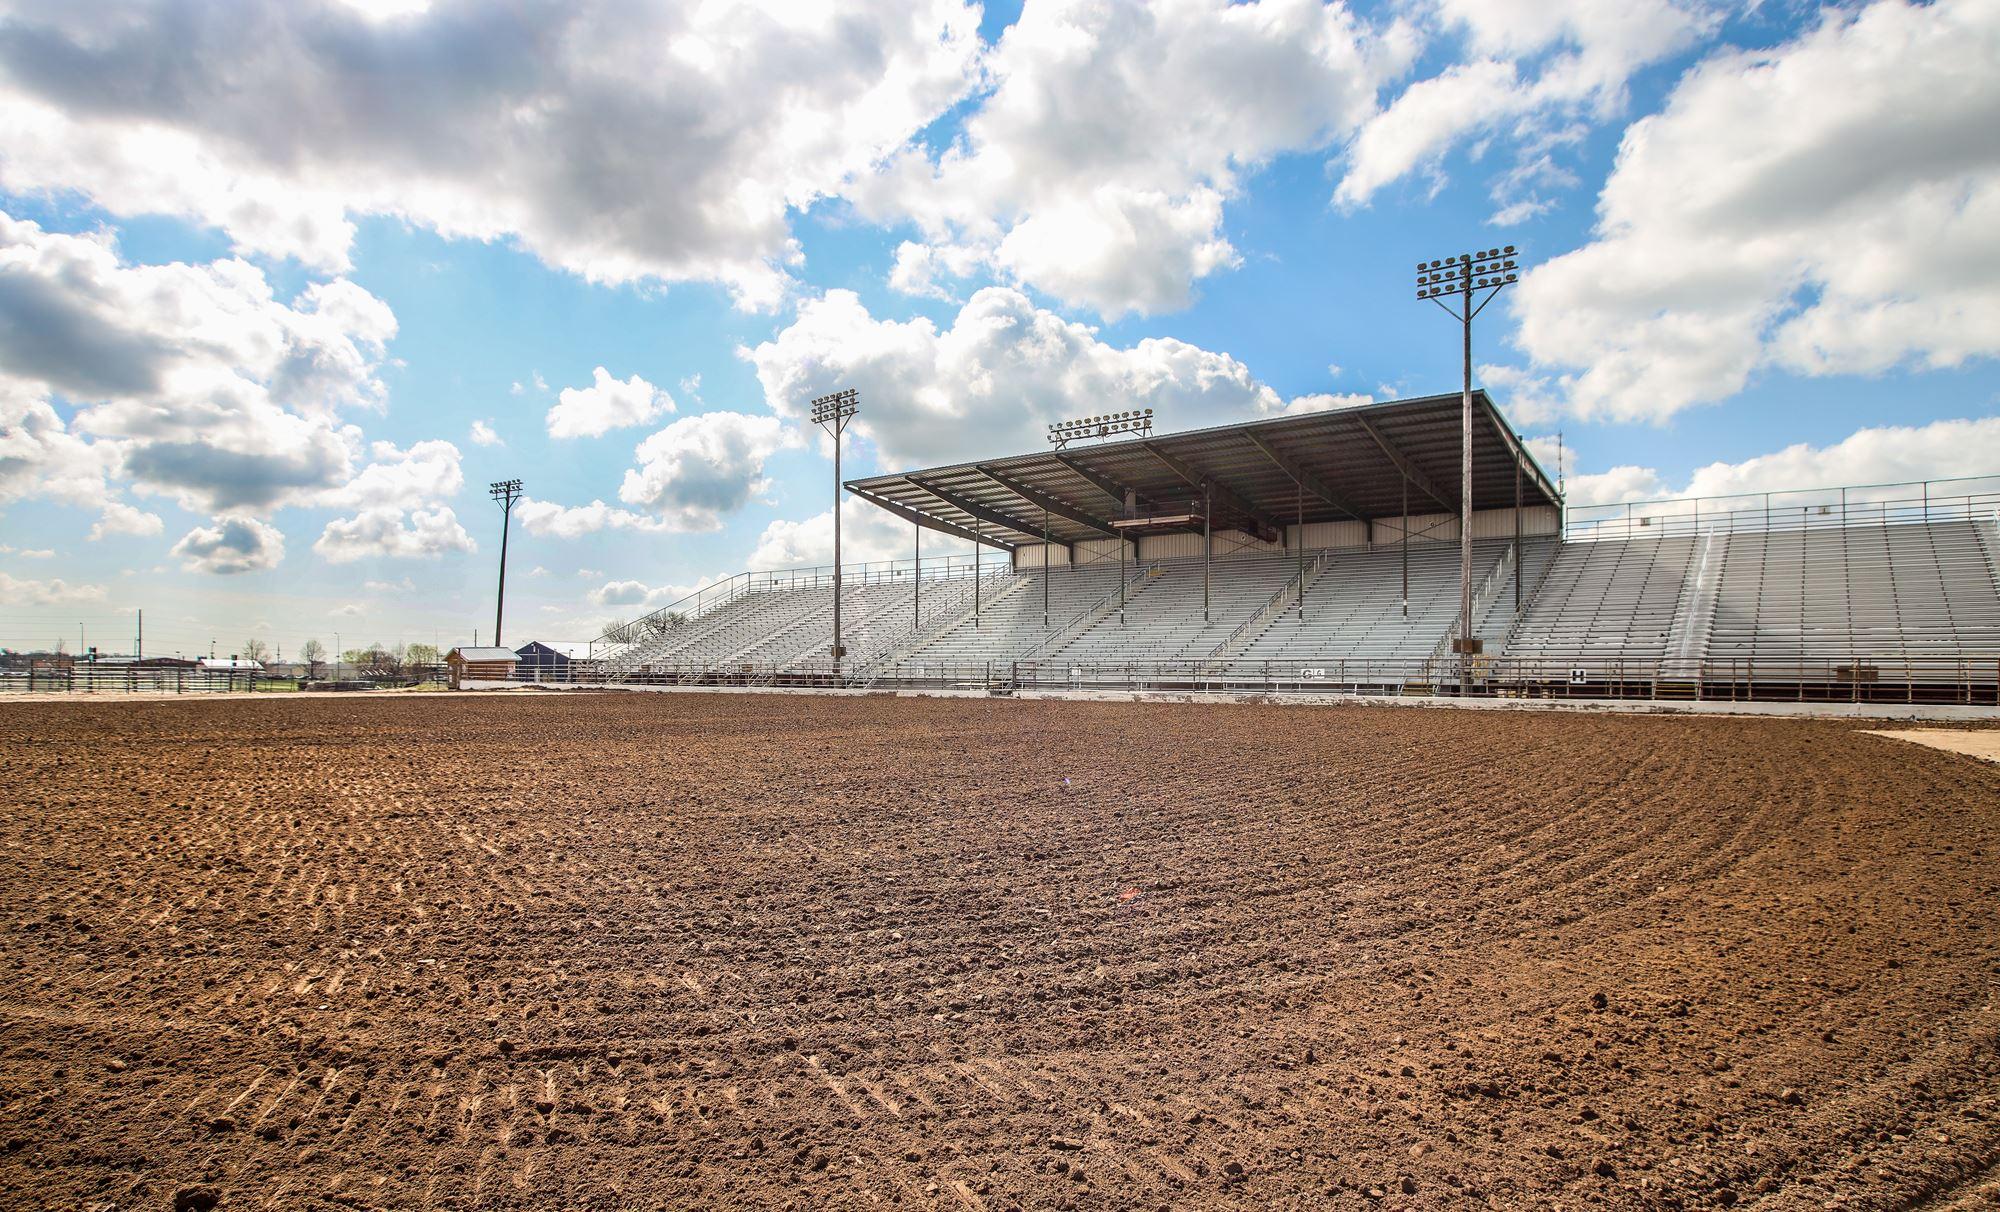 WW Grandstand Arena